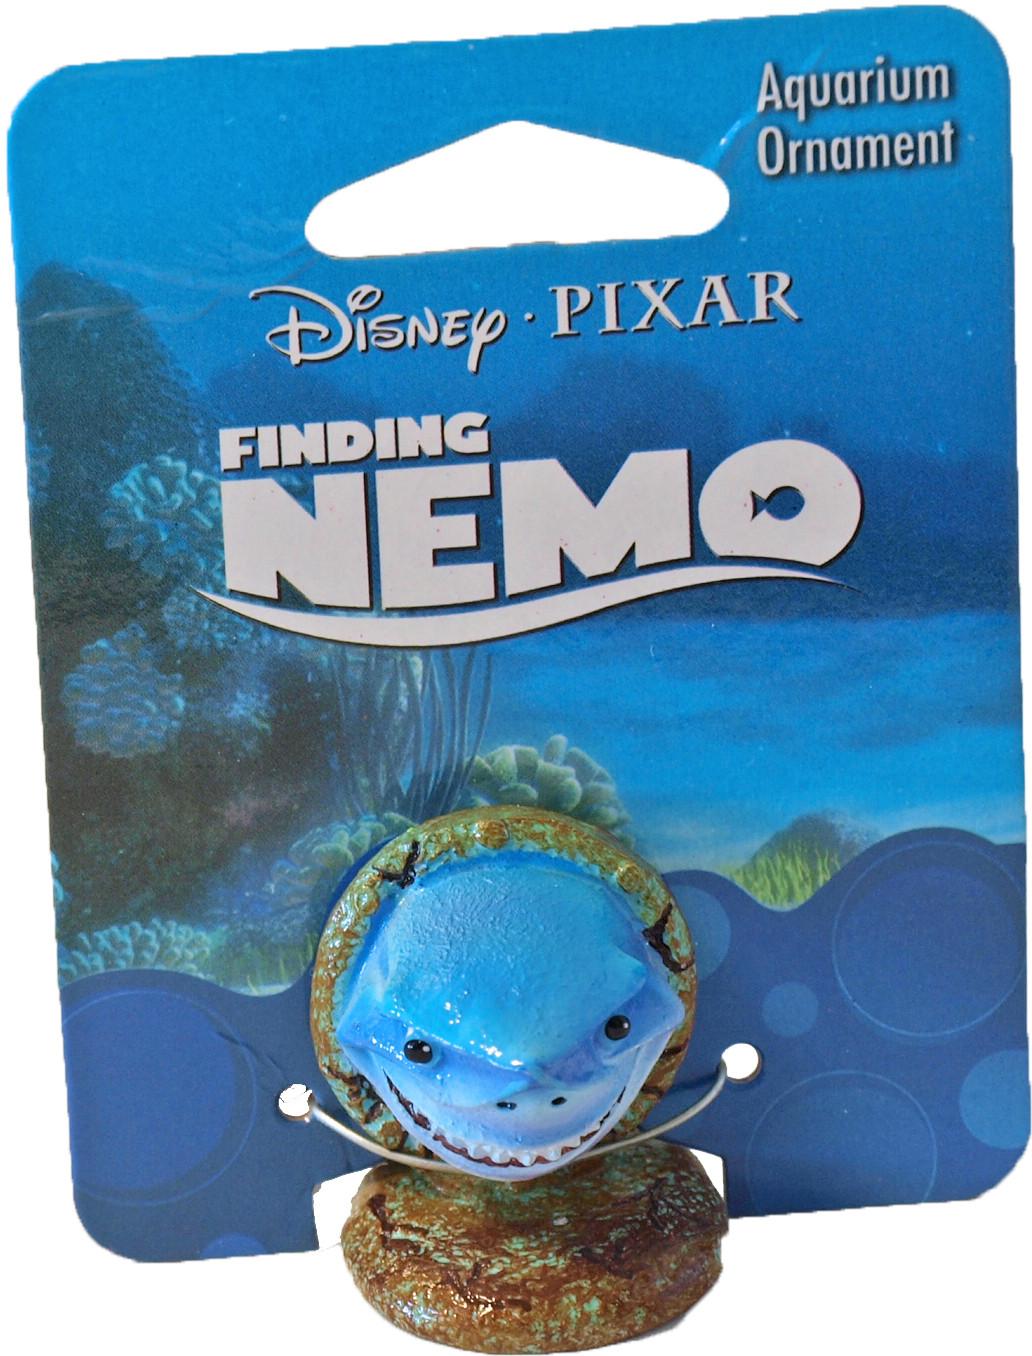 Penn Plax Nemo ornament Bruce